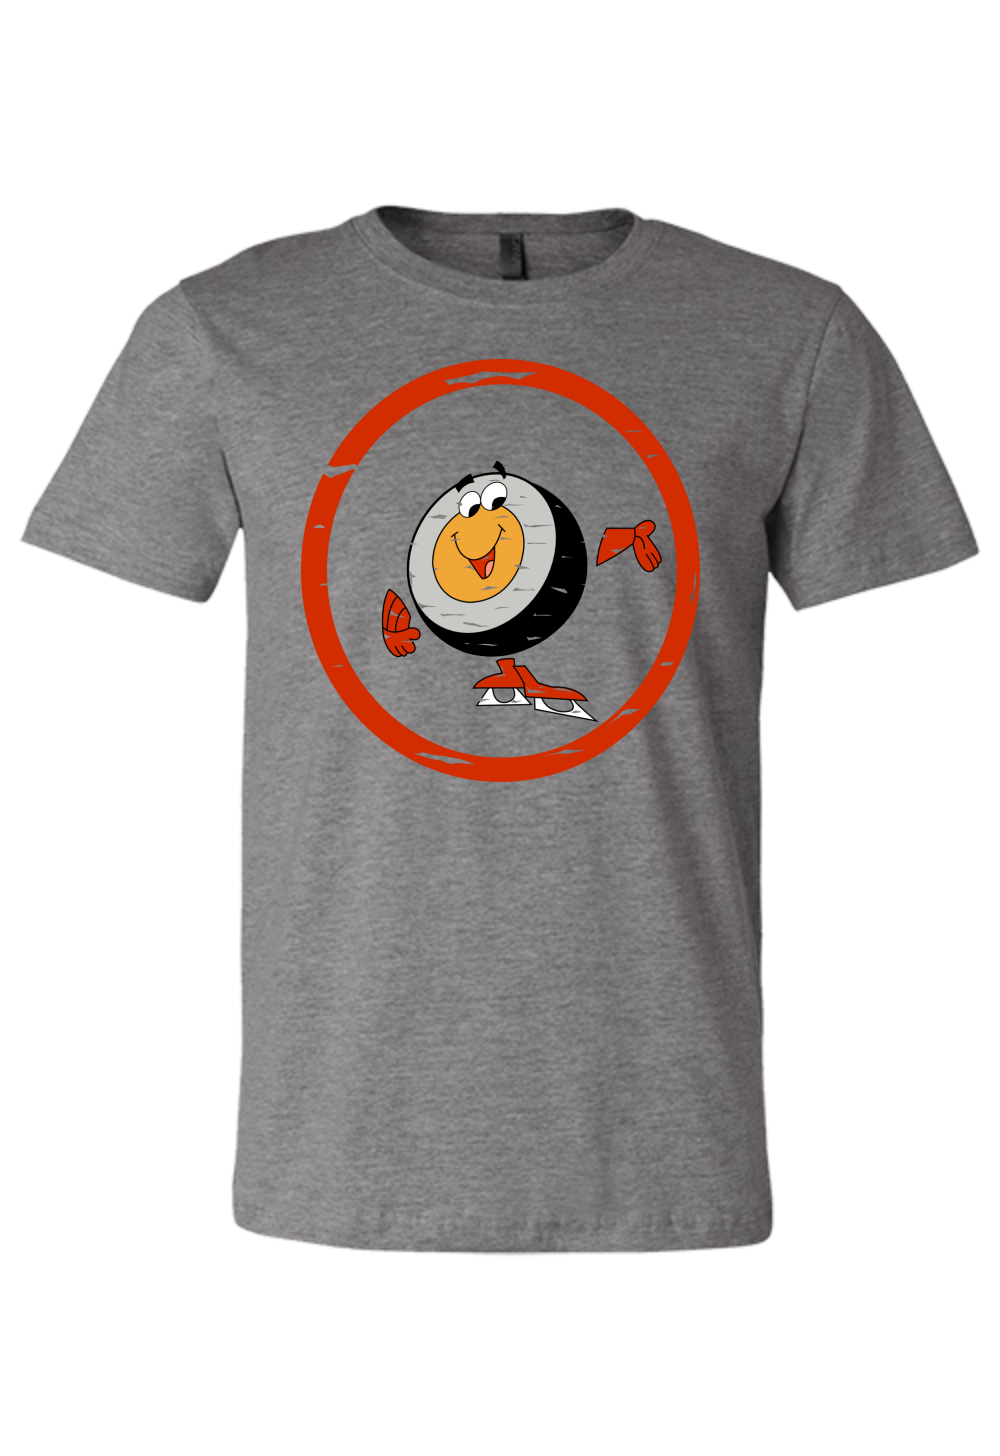 Retro Peter Puck T-Shirt Premium Tee